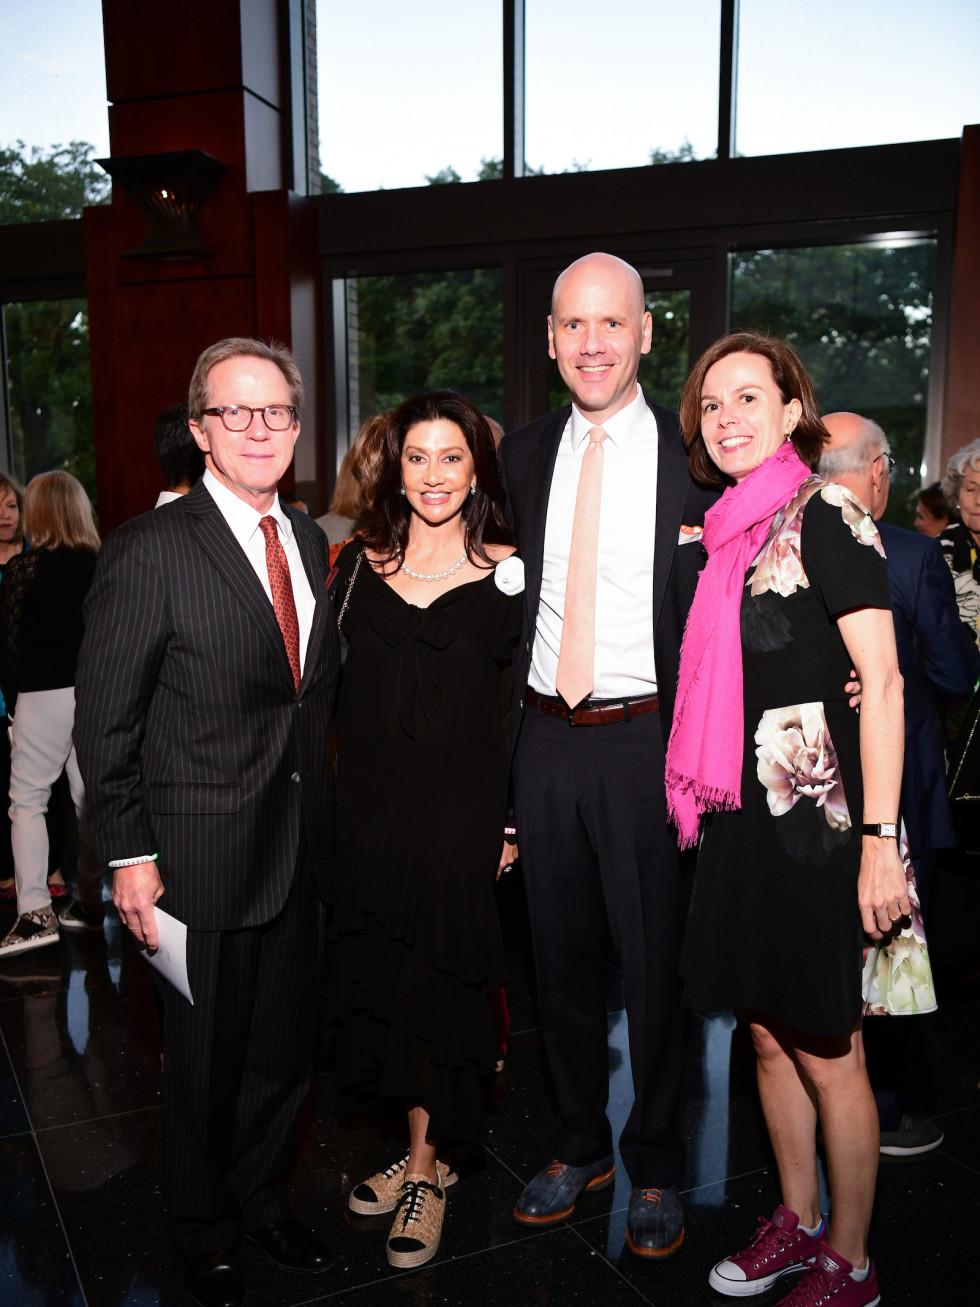 UH Public Art 50th Celebration: Erik and Nancy Littlejohn, John Wehrle, Emily Griffith